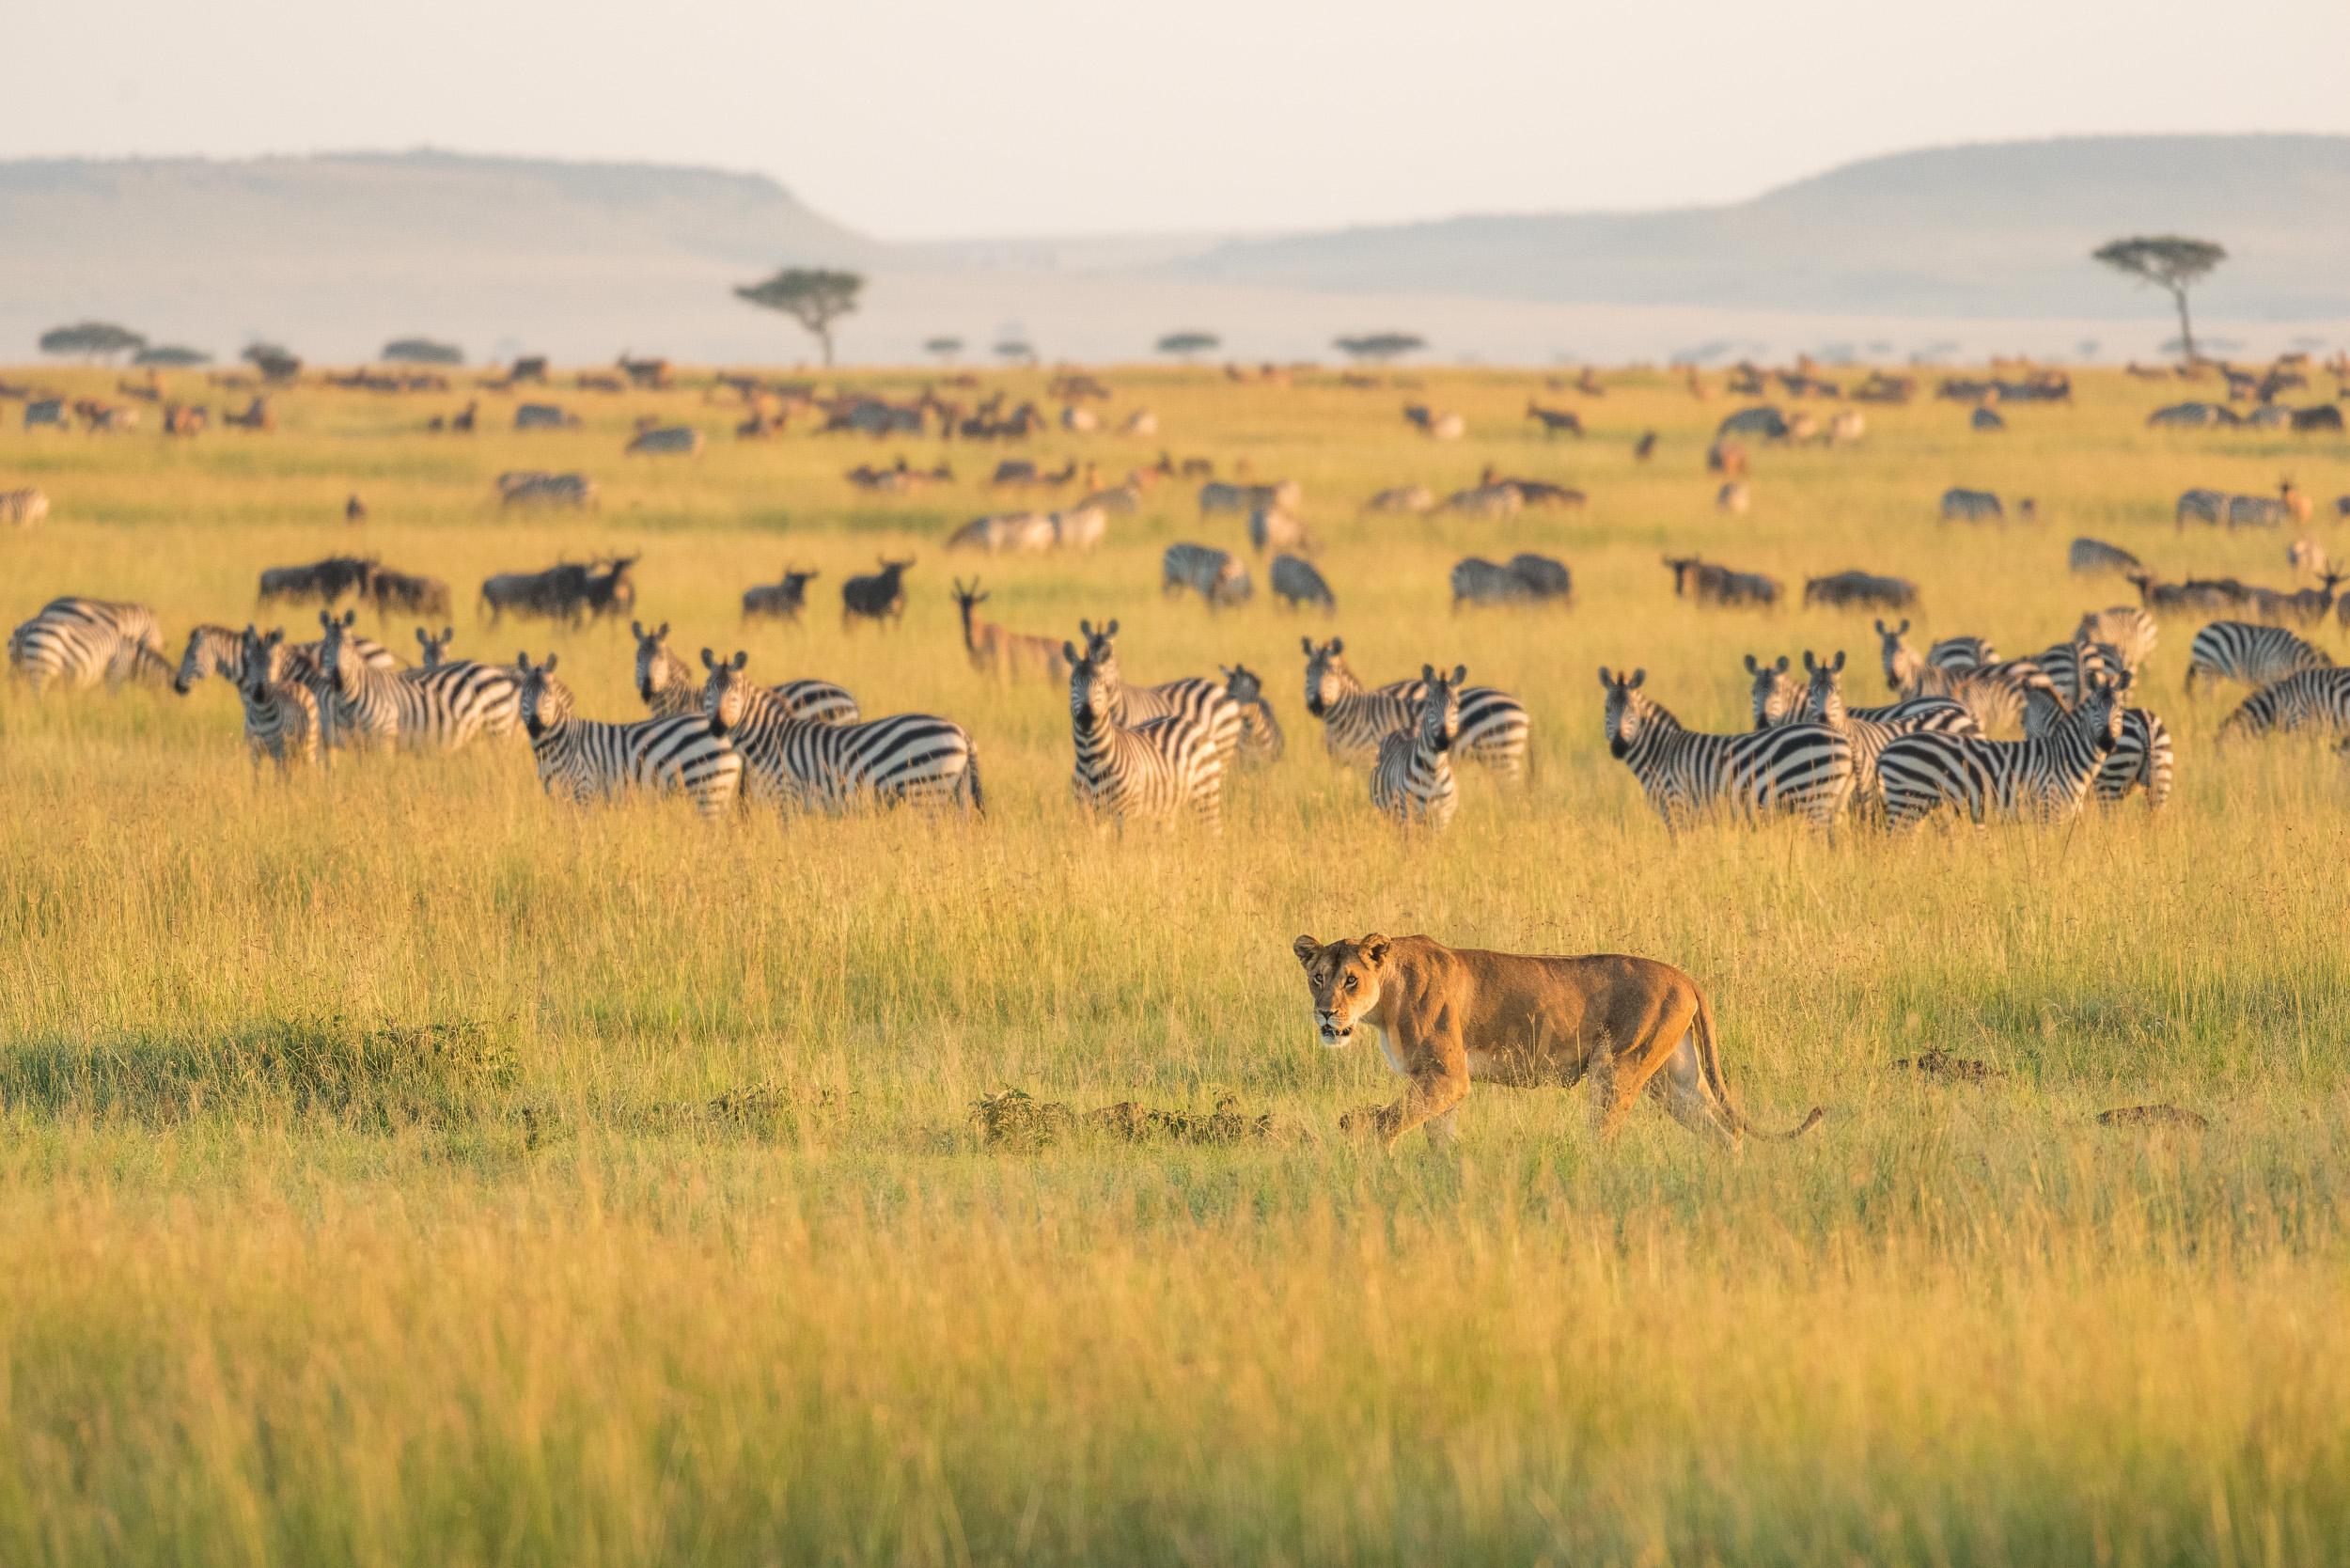 muench-workshops-tanzania-photo-safari.jpg